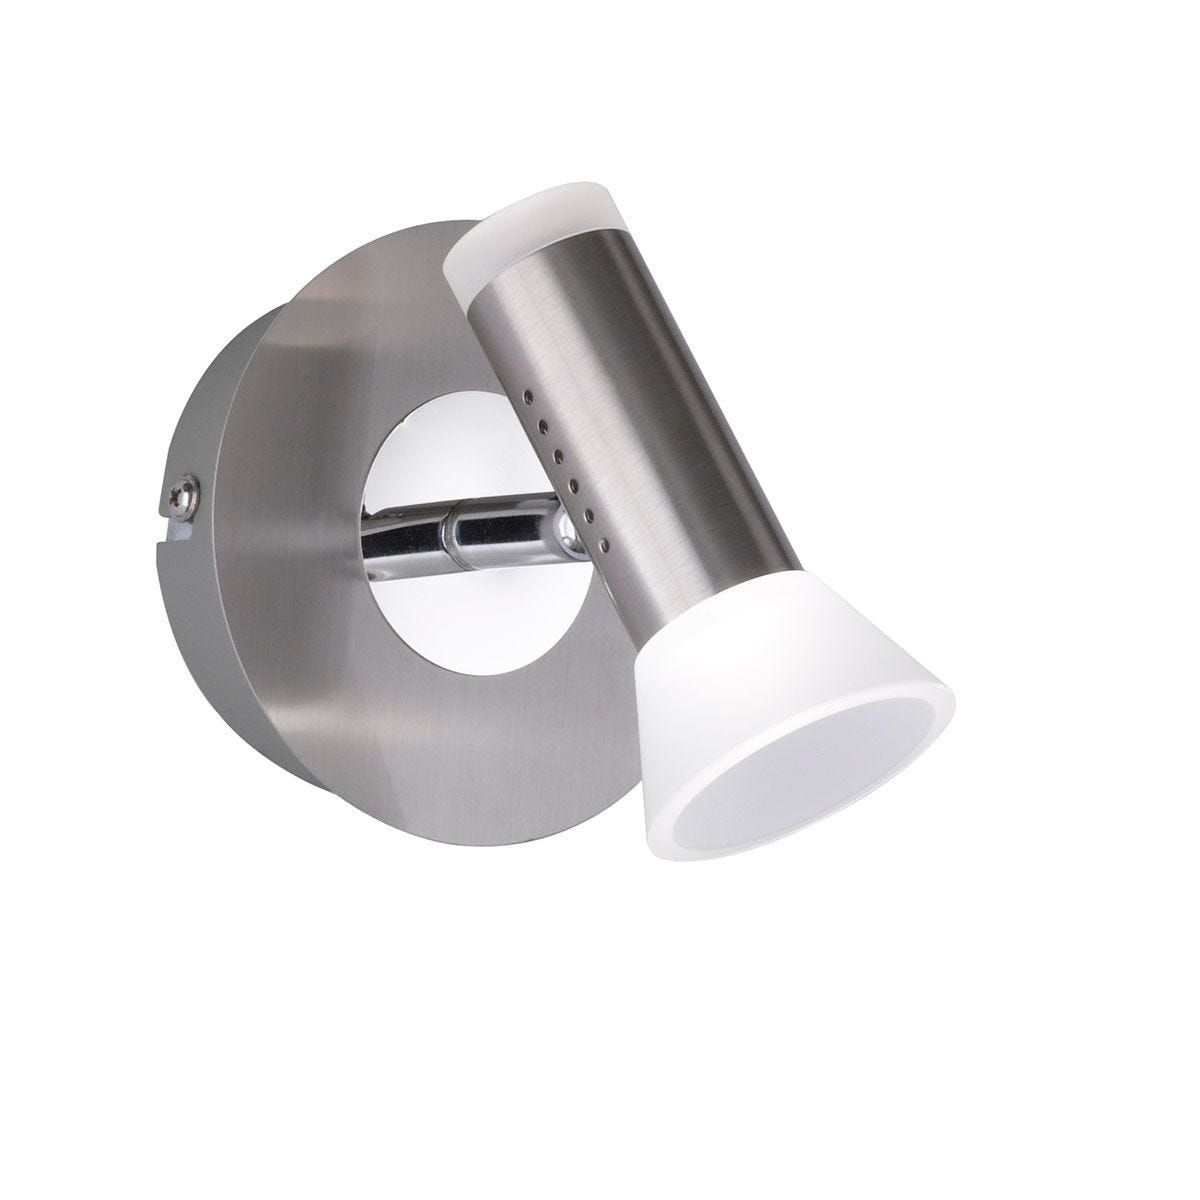 Wofi Lana LED Wall Lamp - Nickel Matt Finish & Chrome